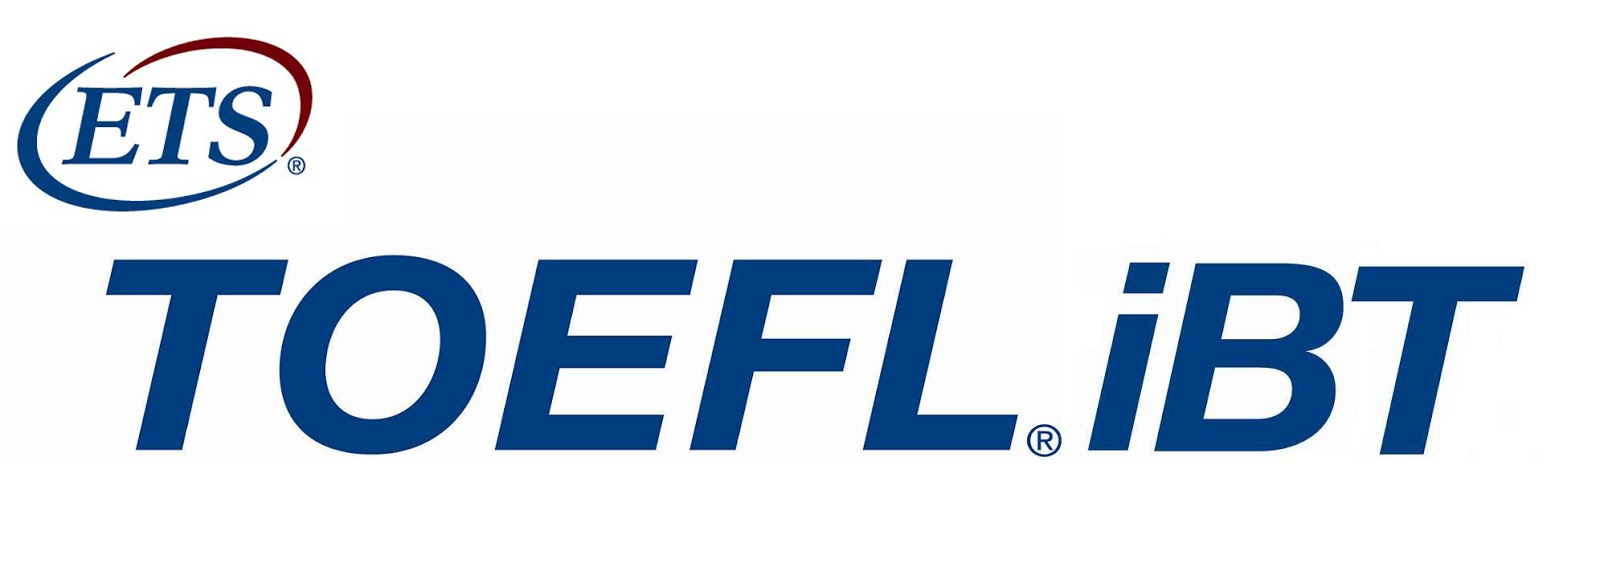 TPO 1-54 offline software download for free! - TOEFL iBT 100+